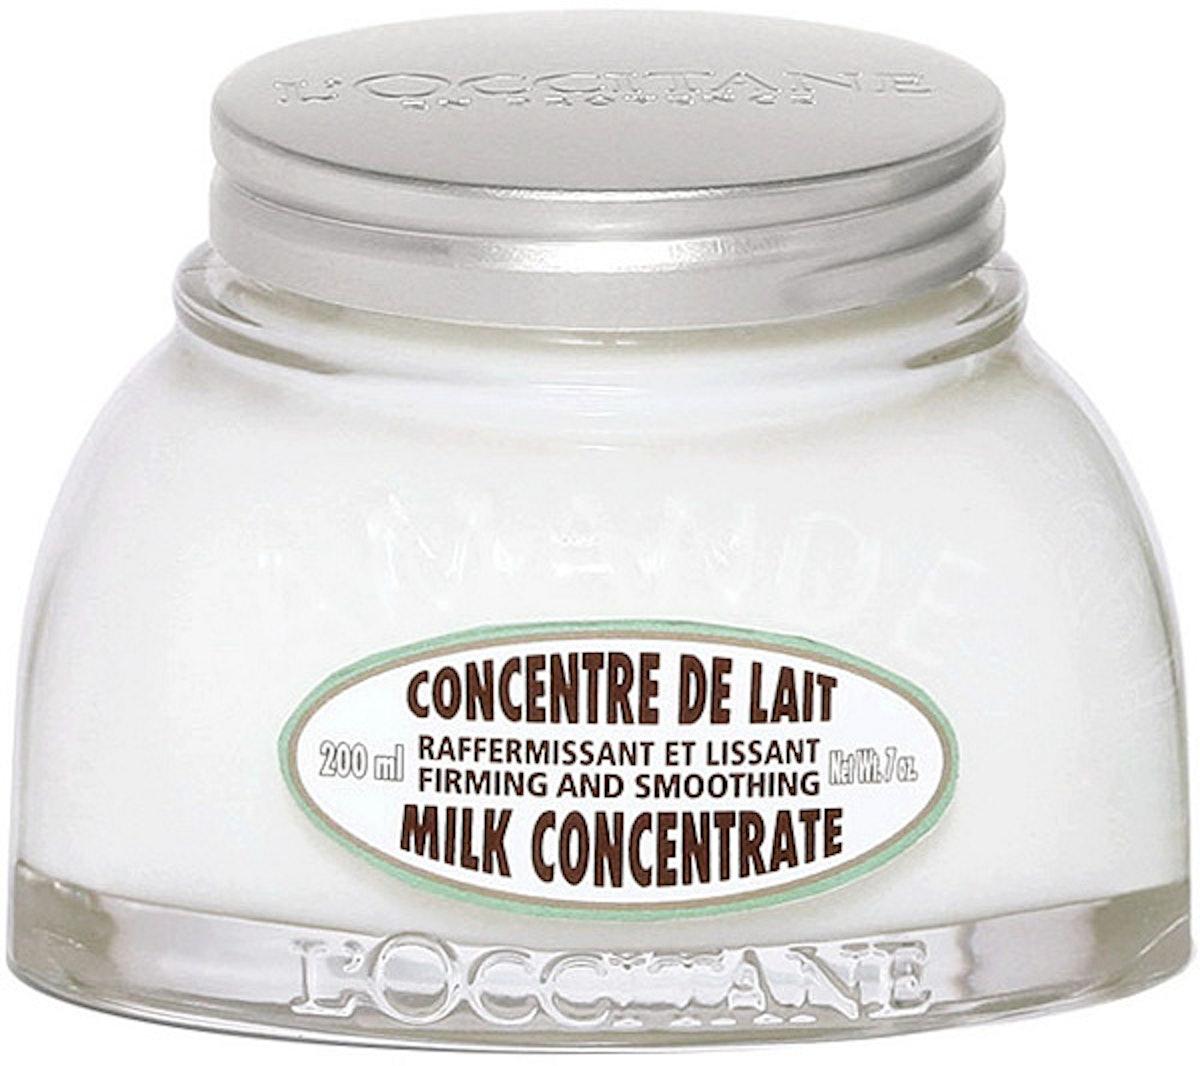 Almond Milk Concentrate